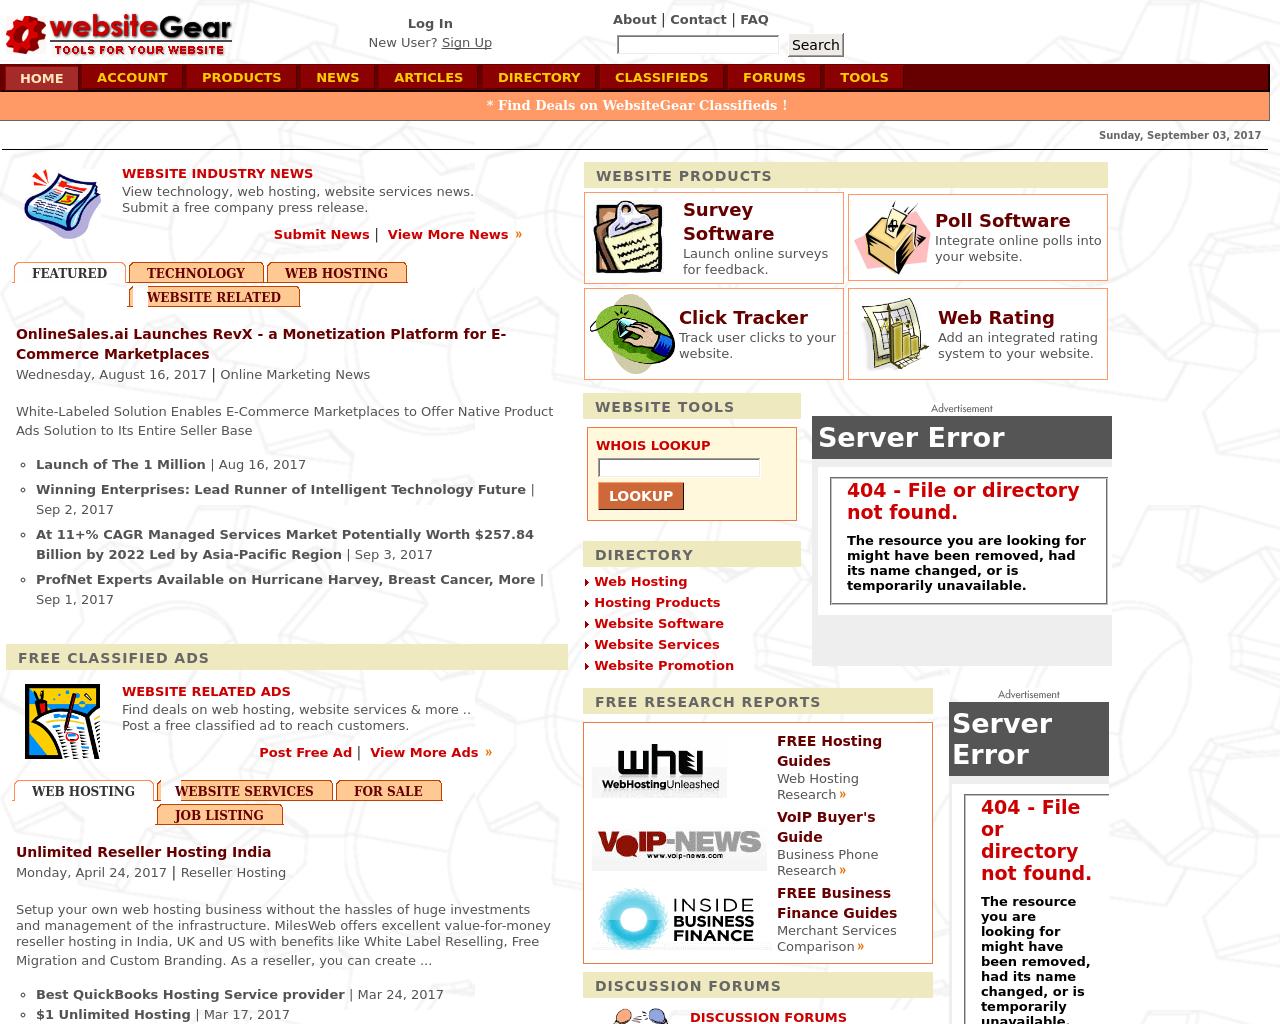 Website-Gear-Advertising-Reviews-Pricing